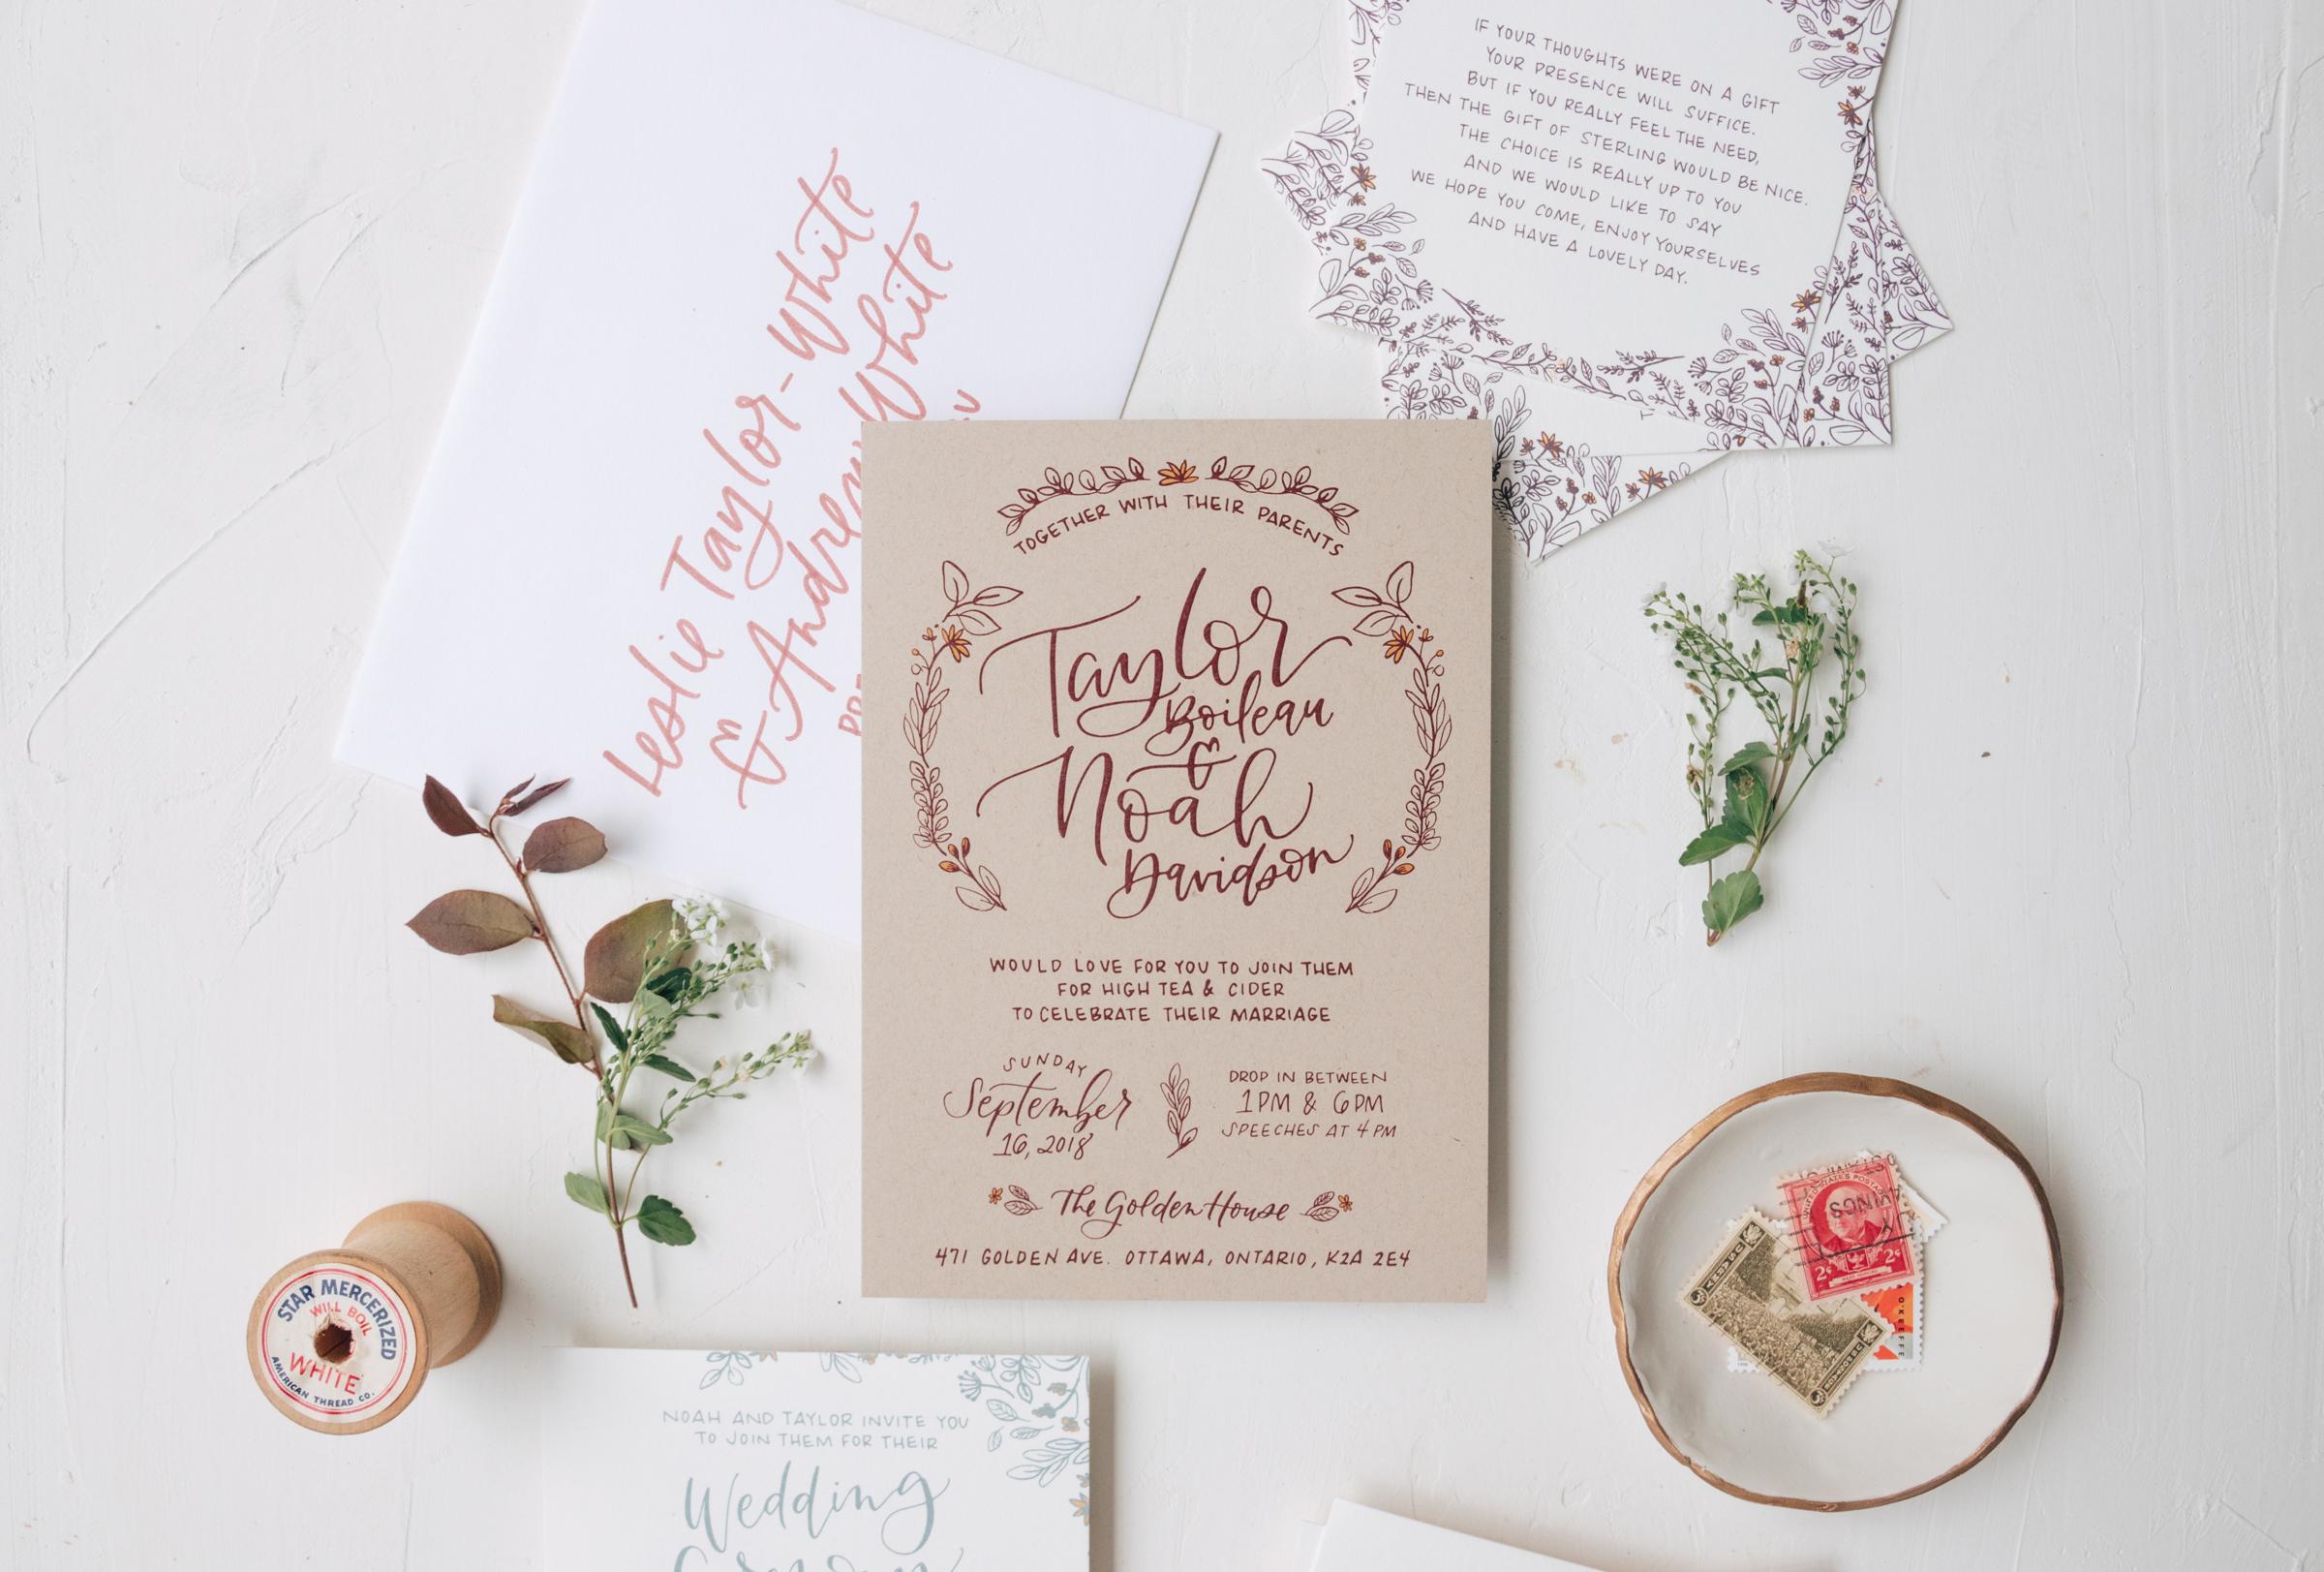 Rustic Hand Lettered Kraft Paper Wedding Invitation